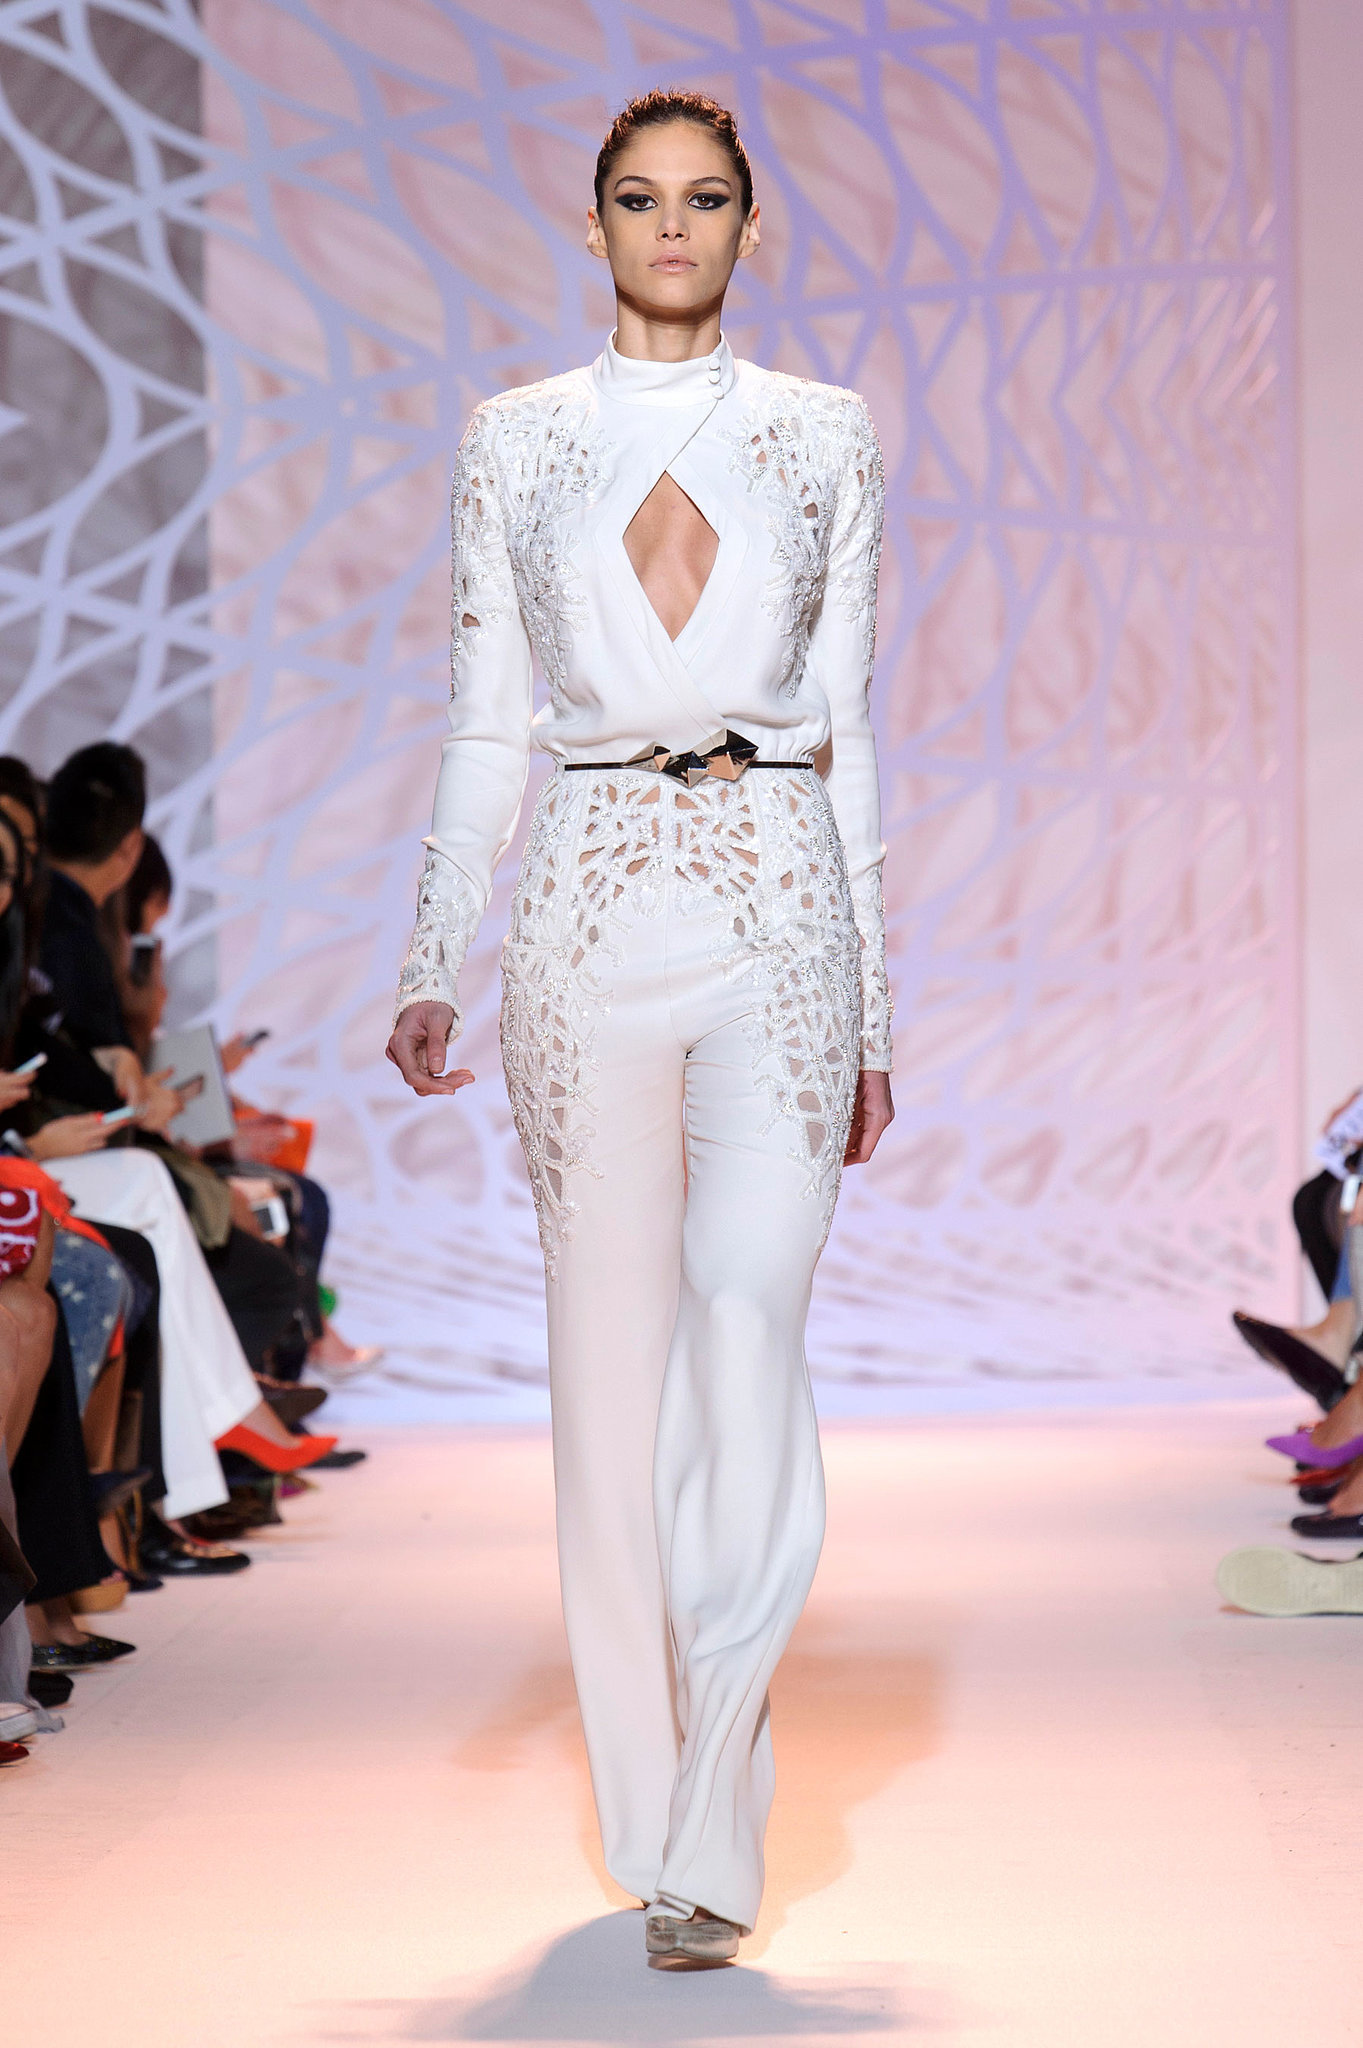 Zuhair-Murad-Haute-Couture-Fall-2014 (7)